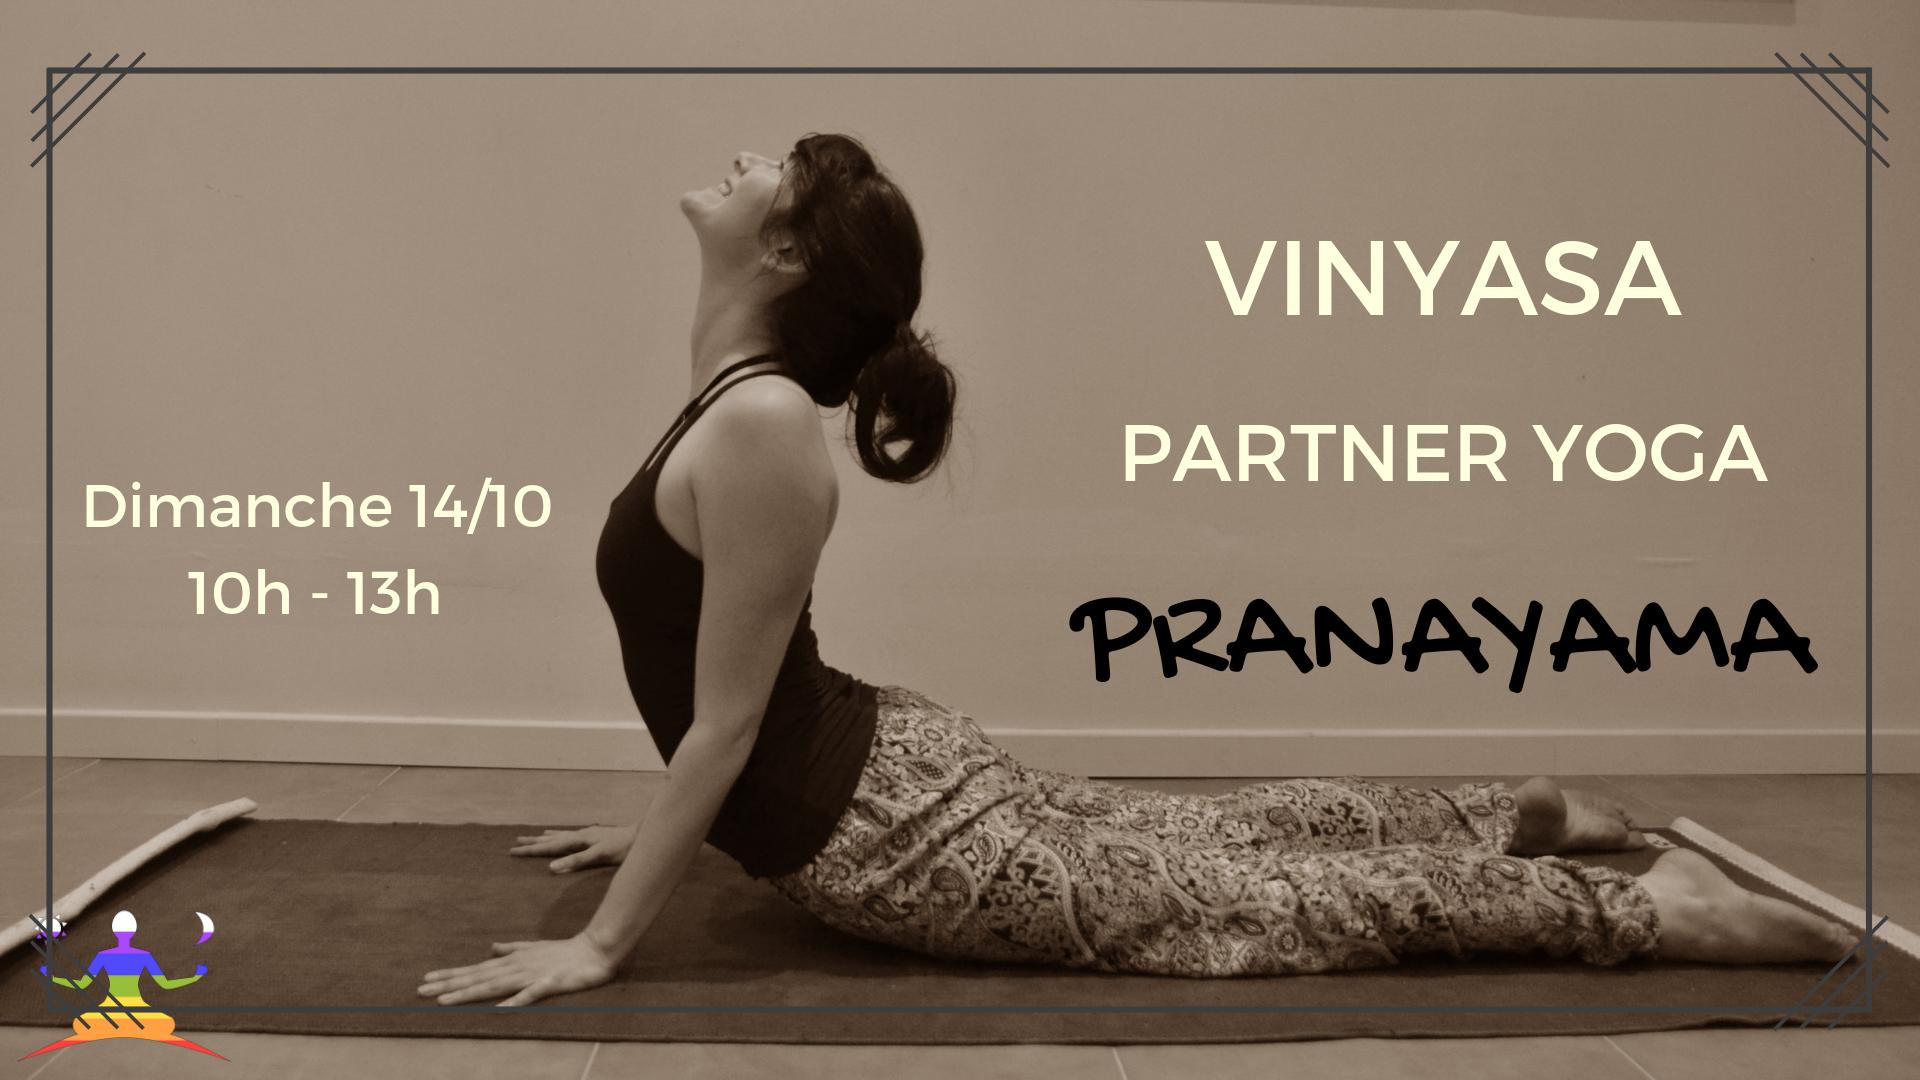 Stage mensuel : Yoga Vinyasa, Partner Yoga et Pranayama